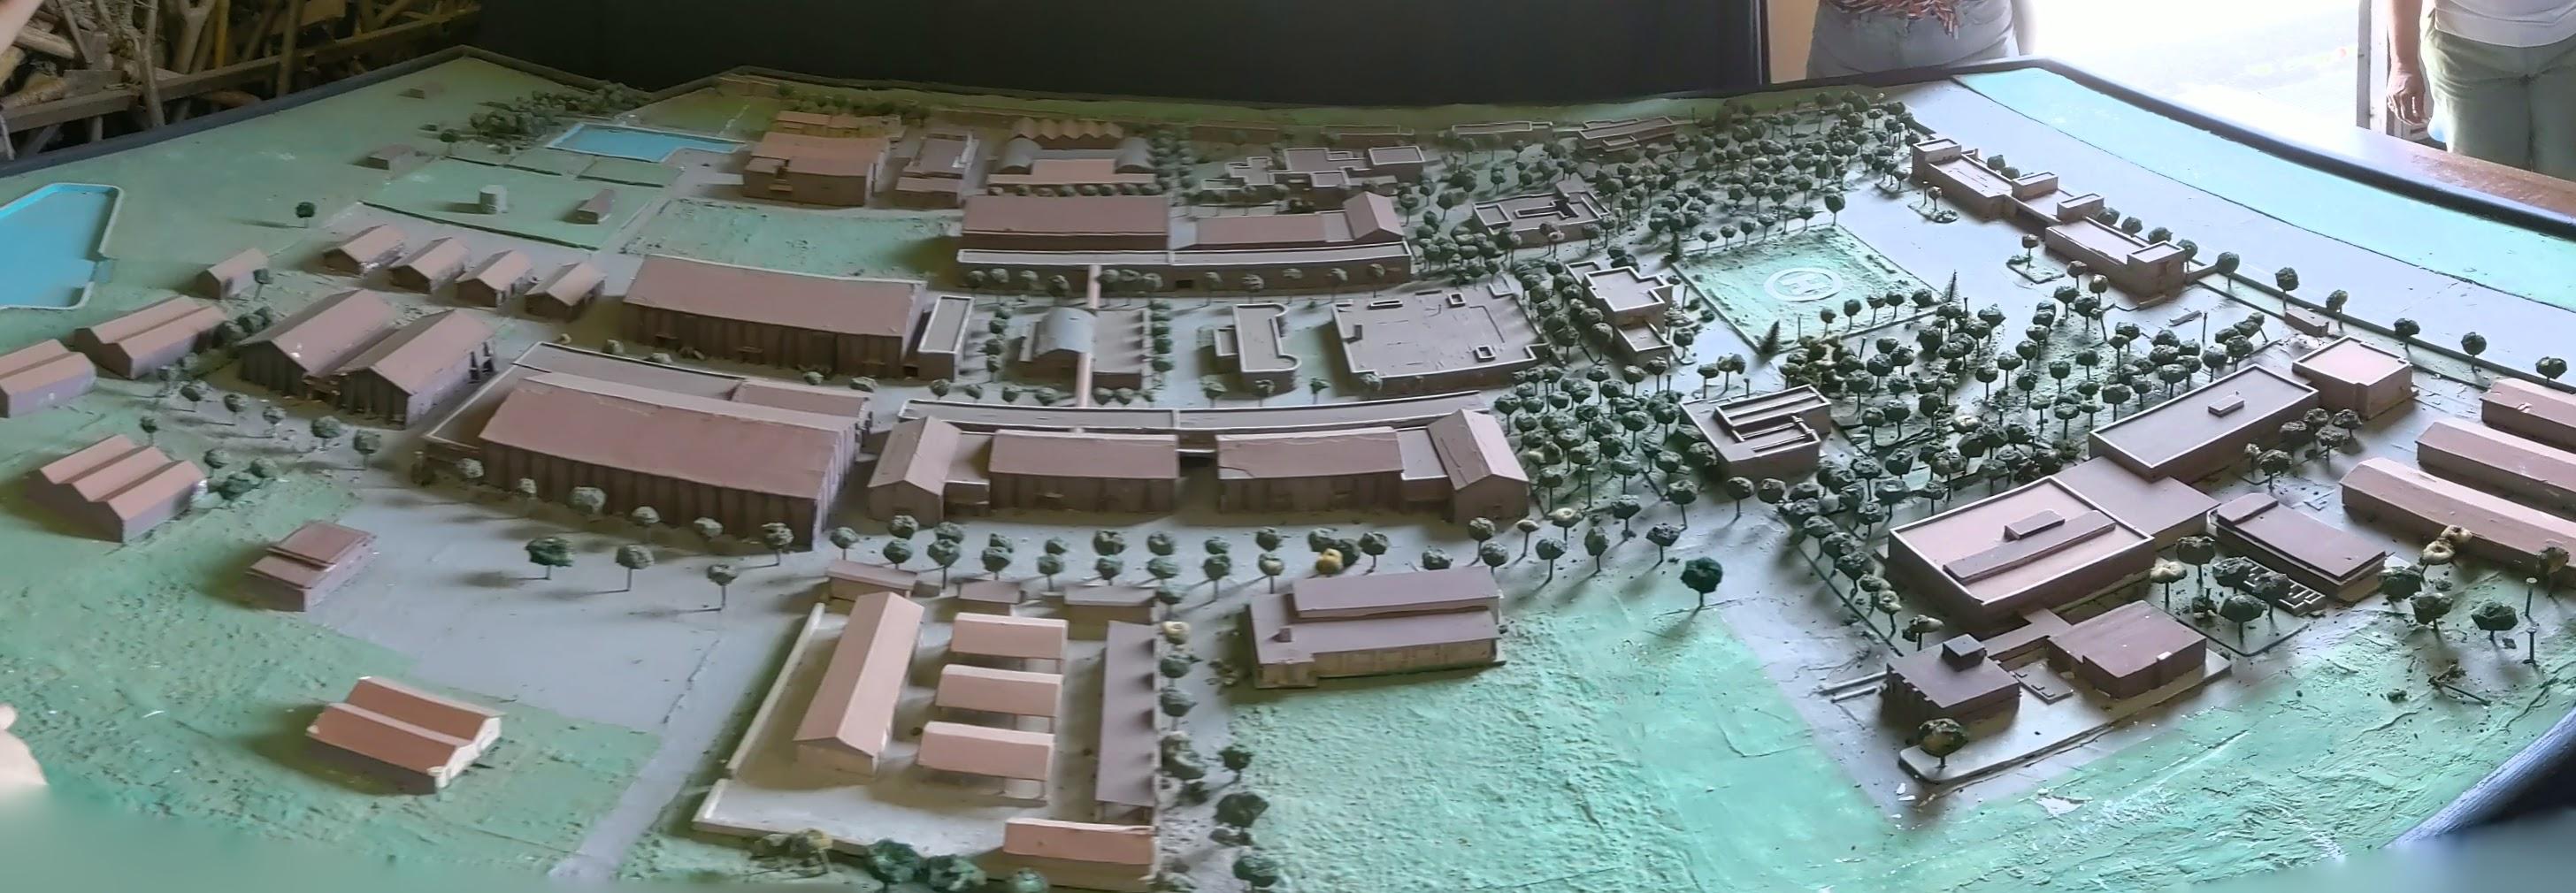 Cinecitta - maquette